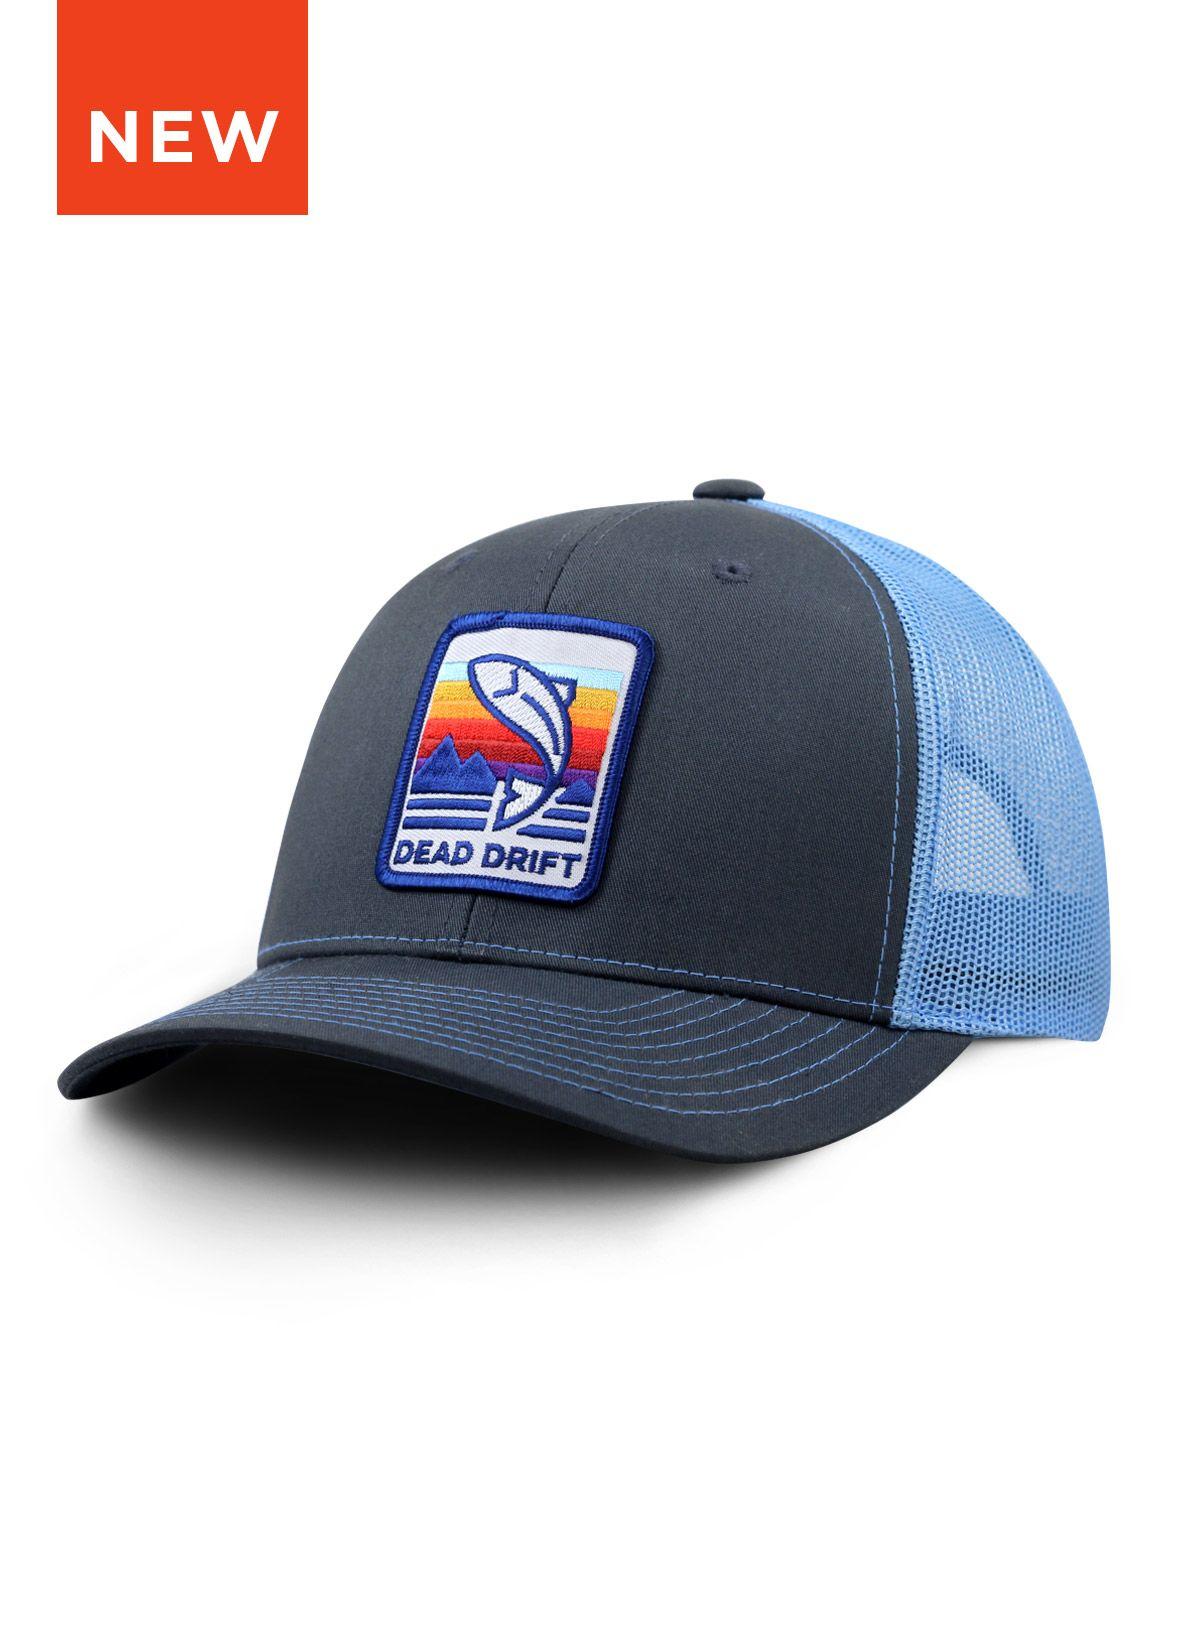 ca387f1c2e1 Cassette Trucker Hat in 2019